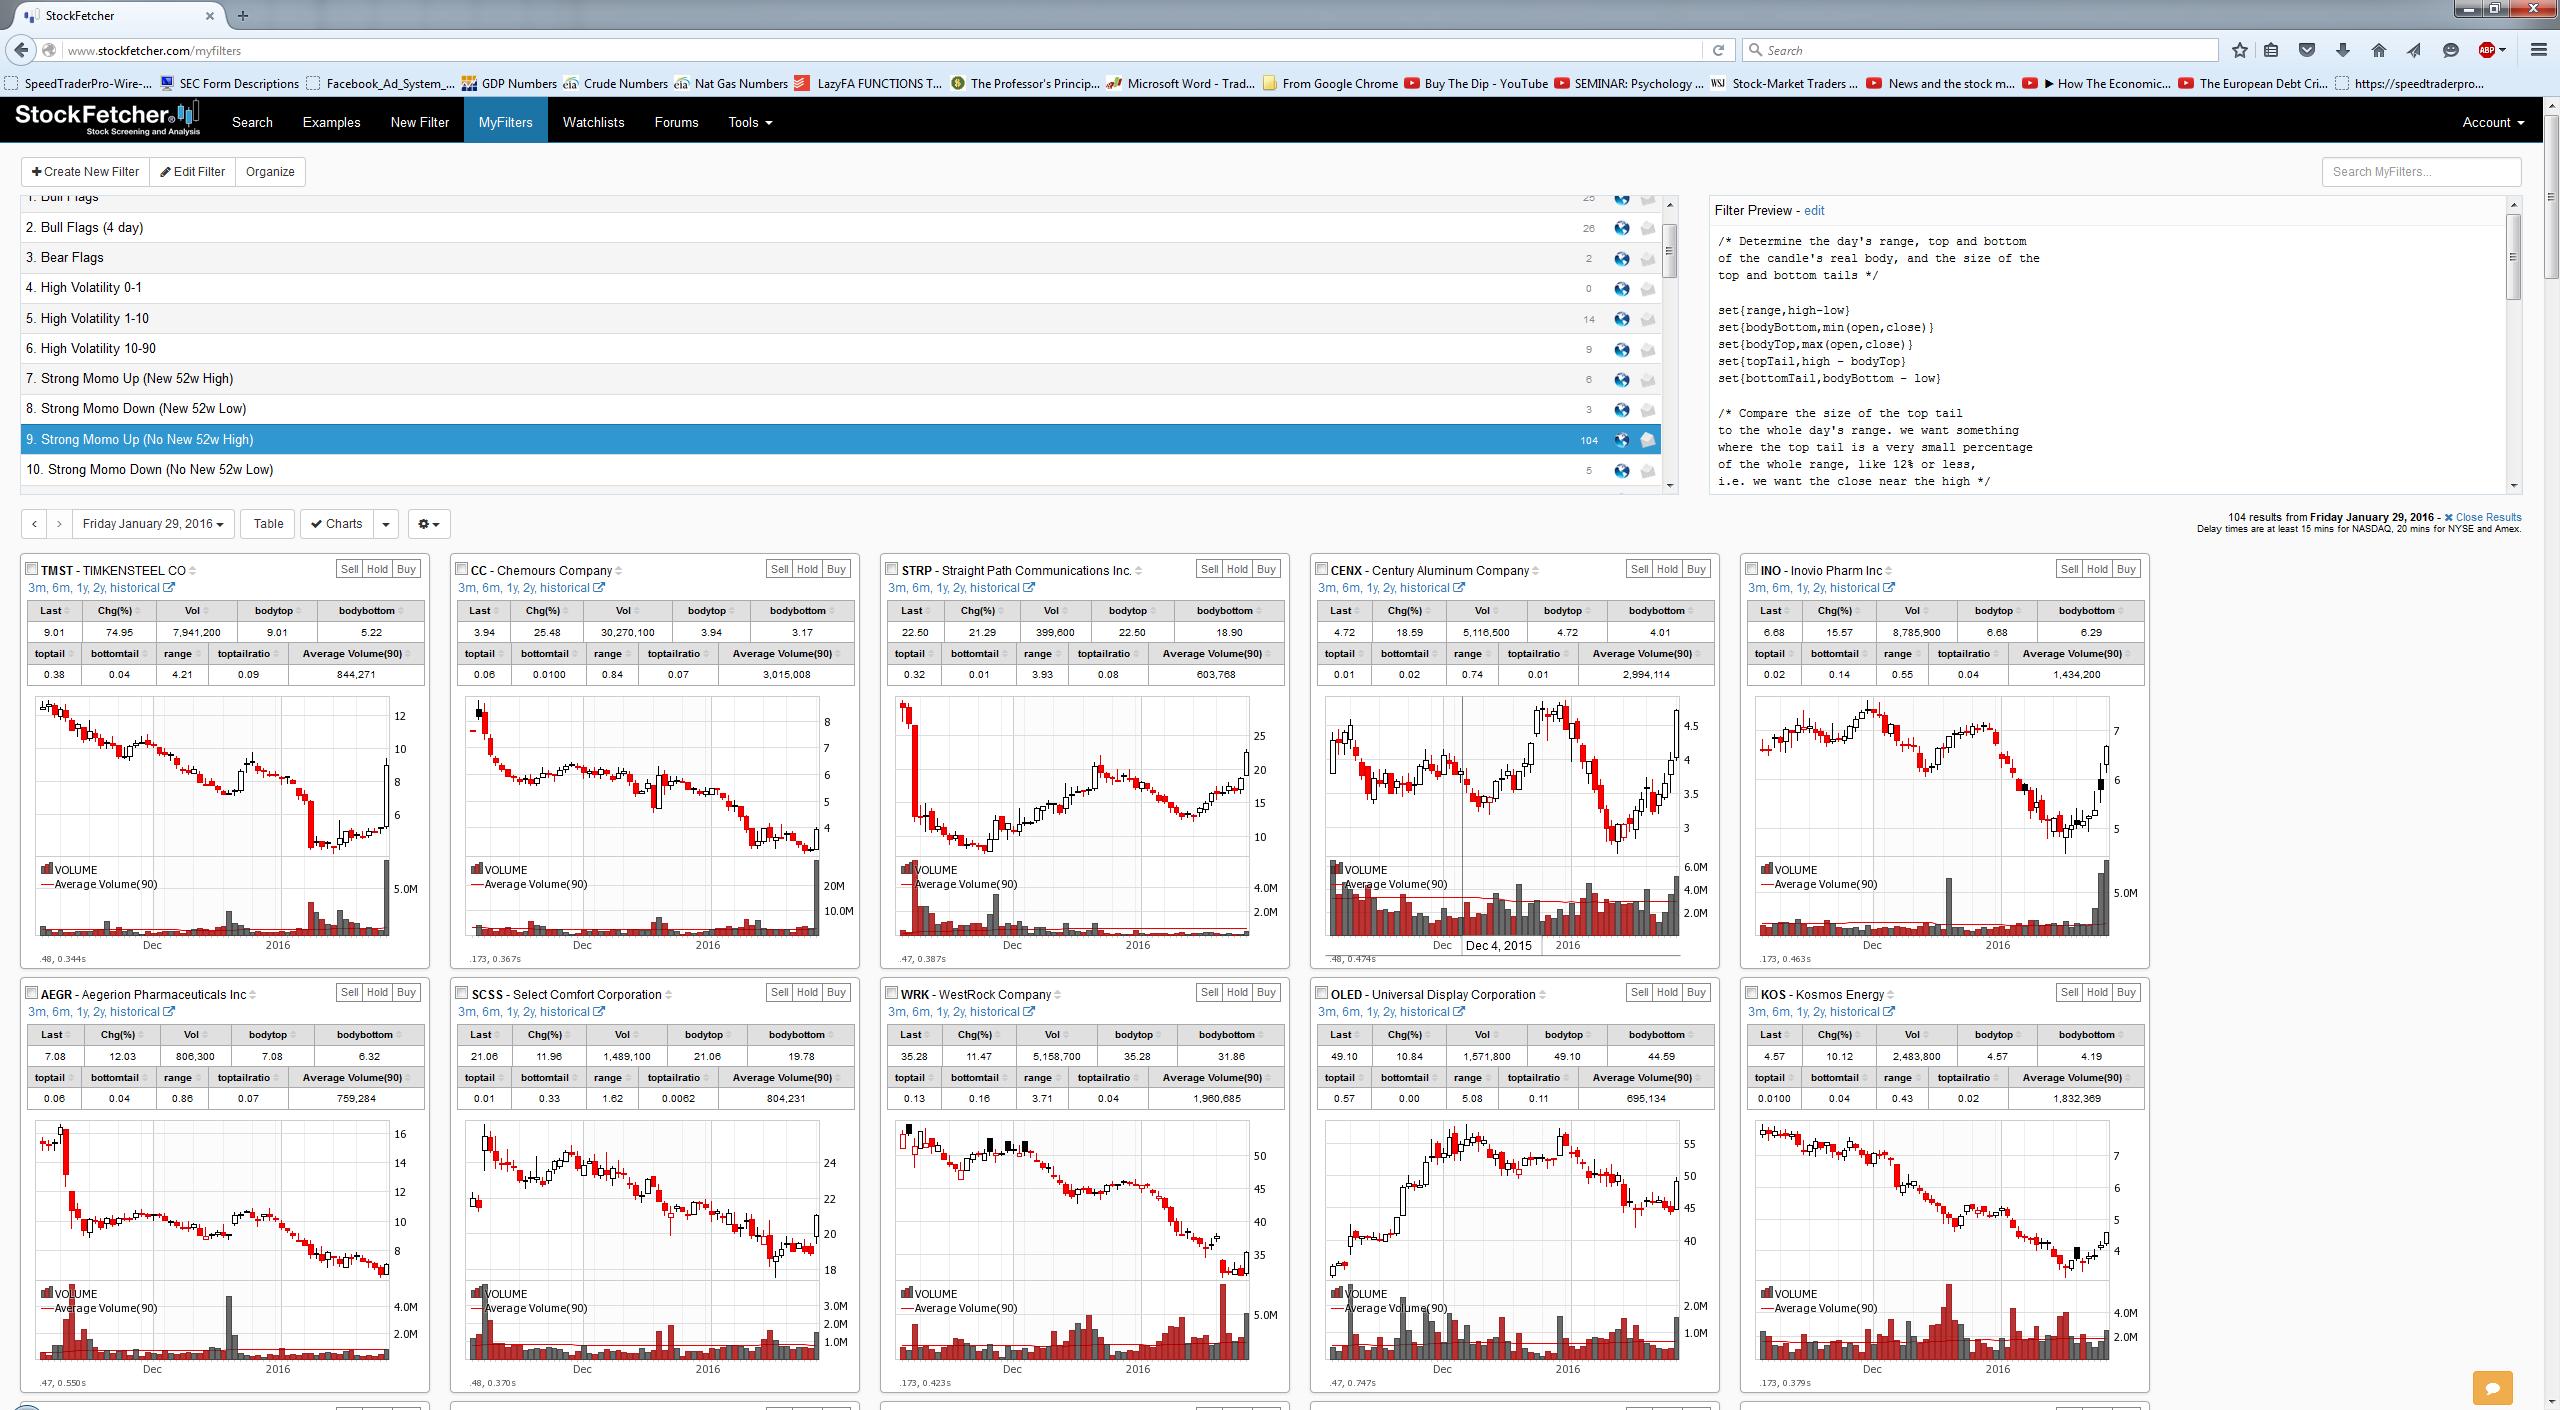 trading_tools_stockfetcher_lazyfa.png